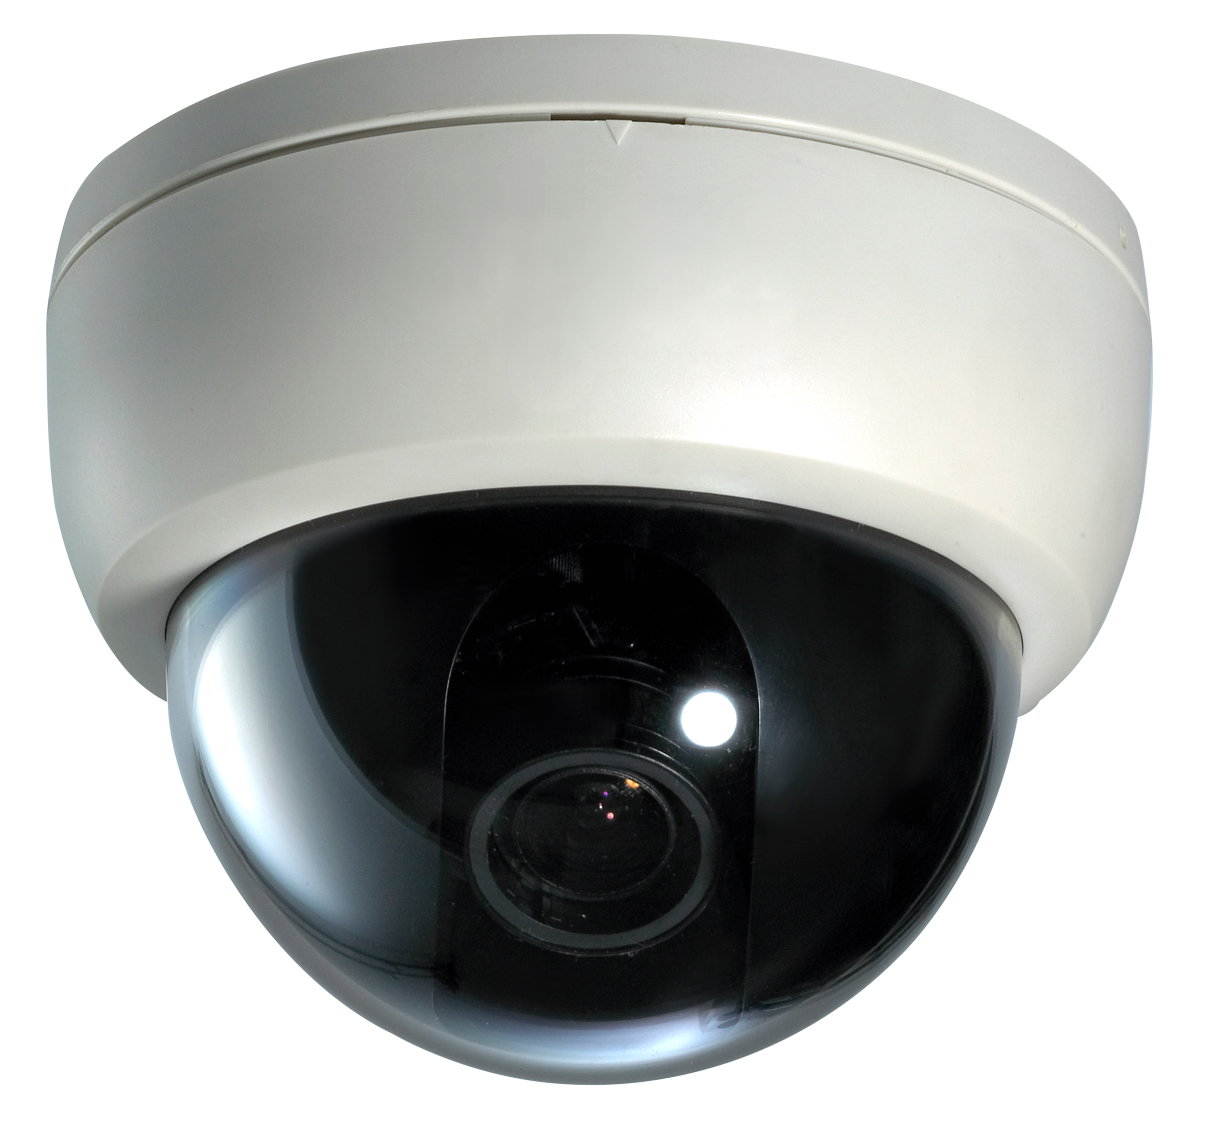 CCTV Cirebon zonacctv.com - Kamera Dome